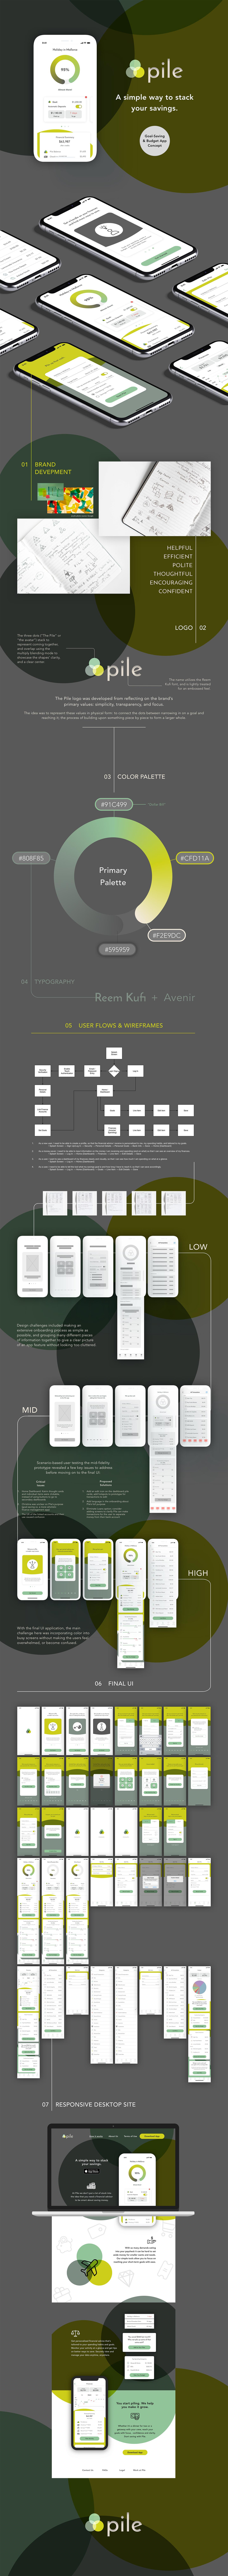 Pile-Case-Study-Revised-7.31.19.jpg